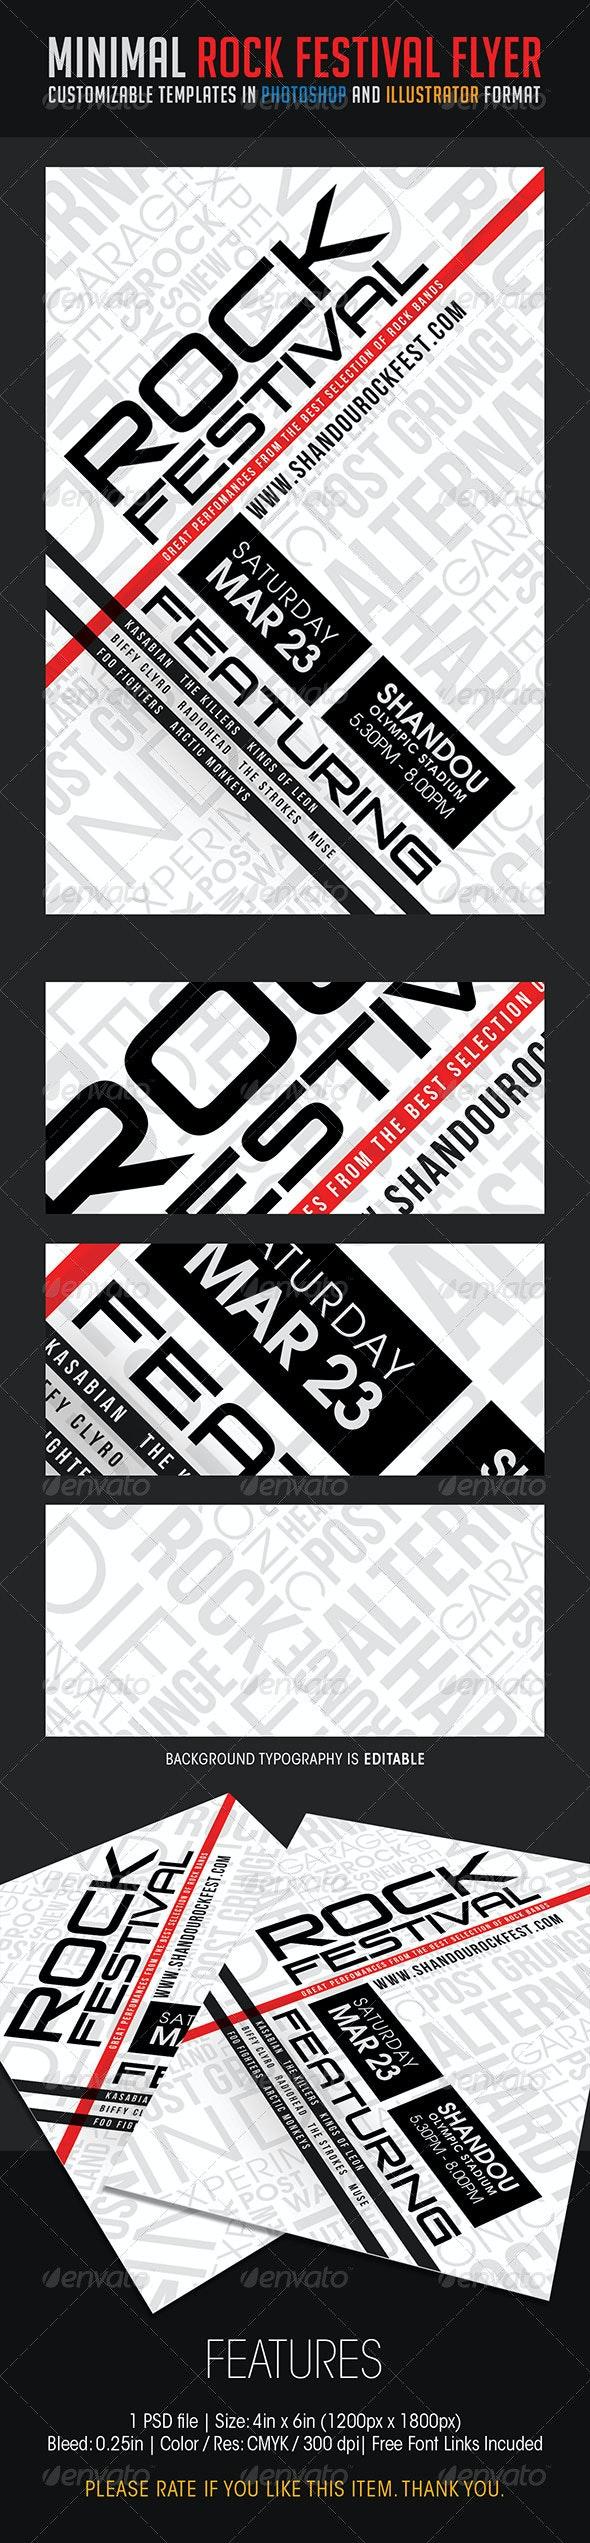 Minimal Rock Festival Flyer - Concerts Events